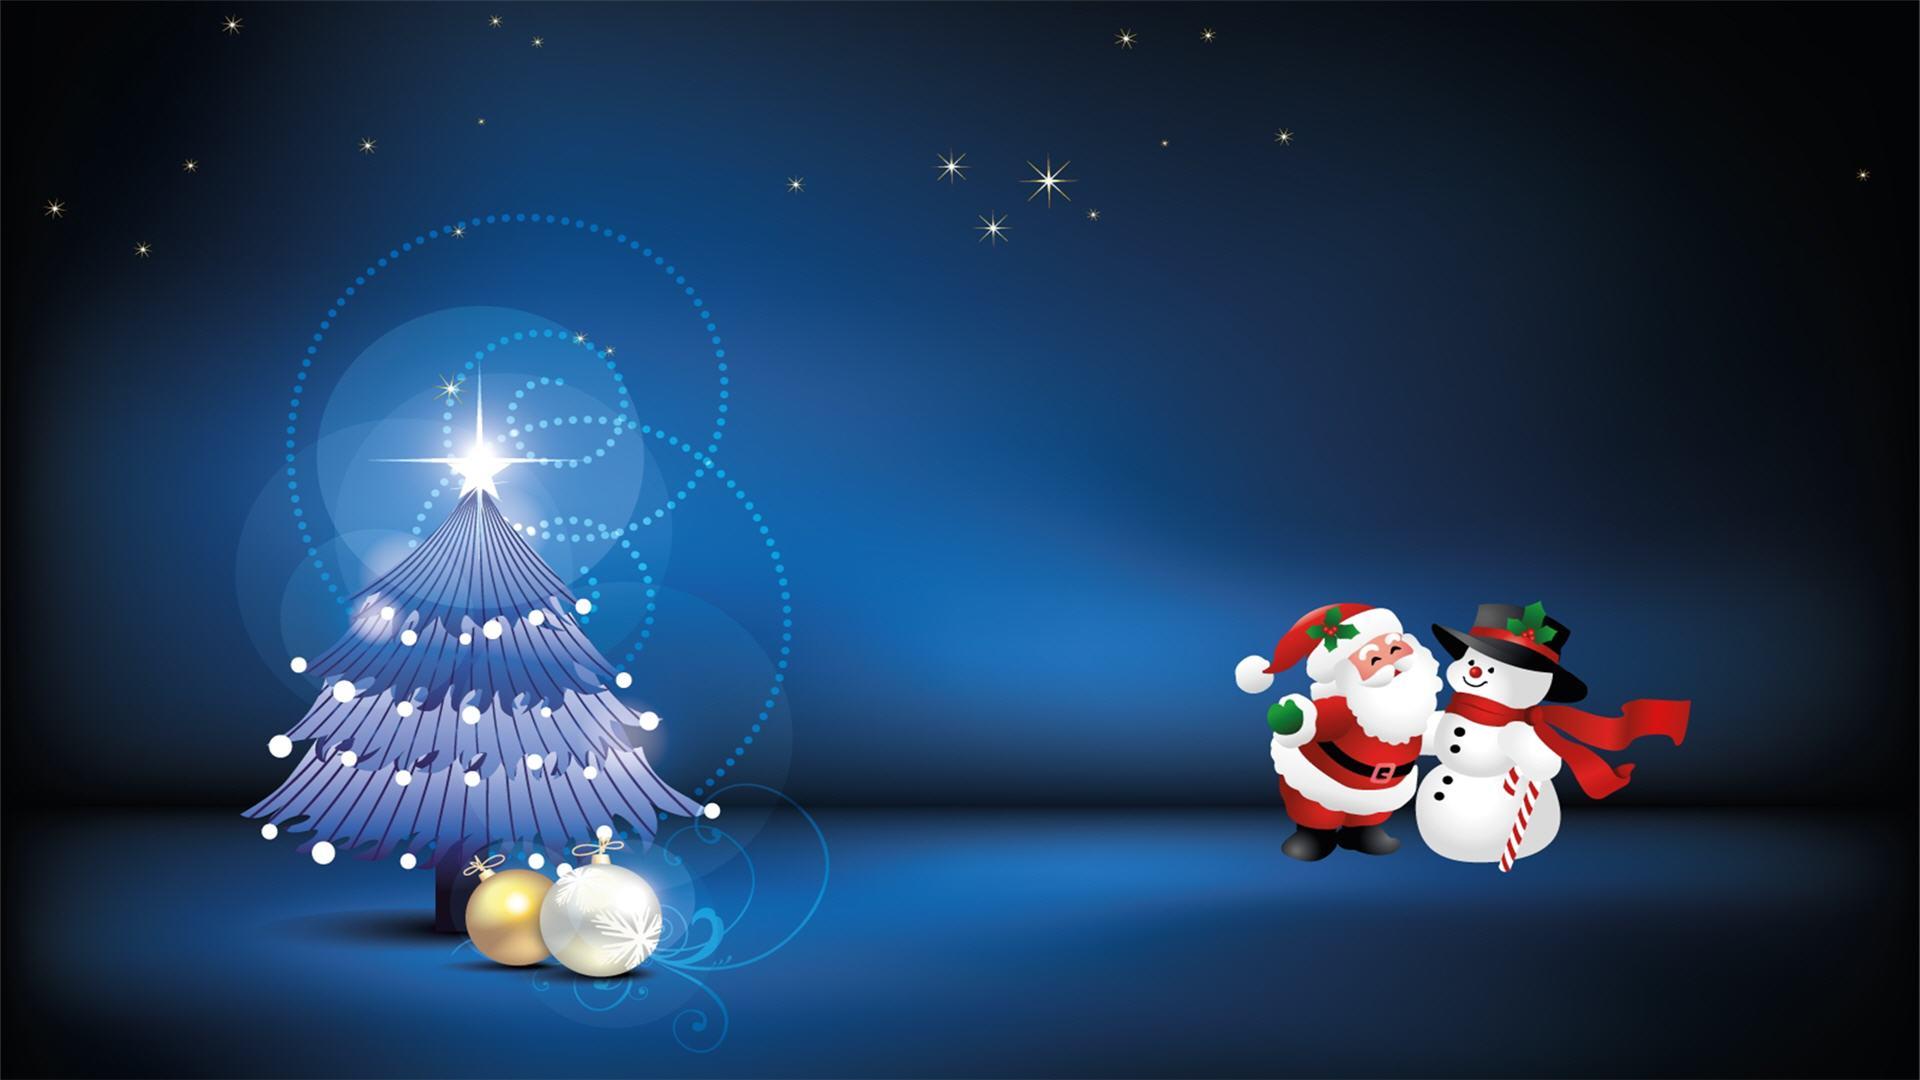 HD Christmas Wallpapers Desktop Backgrounds 2016 1920x1080